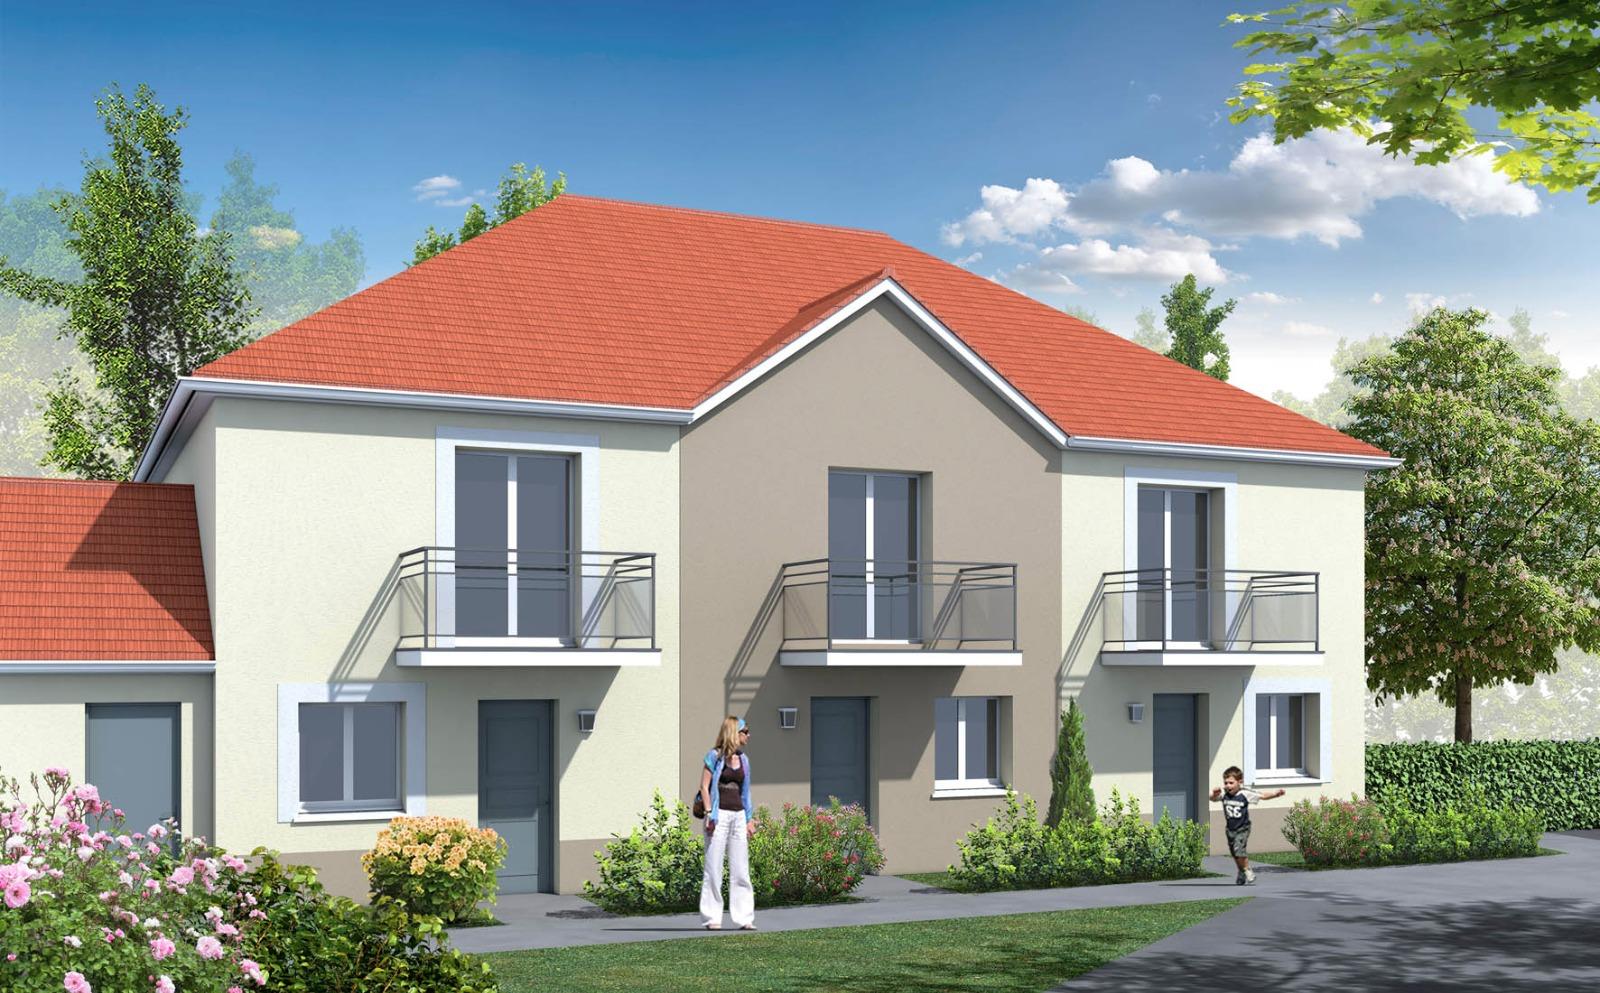 Vente pavillon morigny champigny 91150 78m avec 4 for Garage morigny champigny